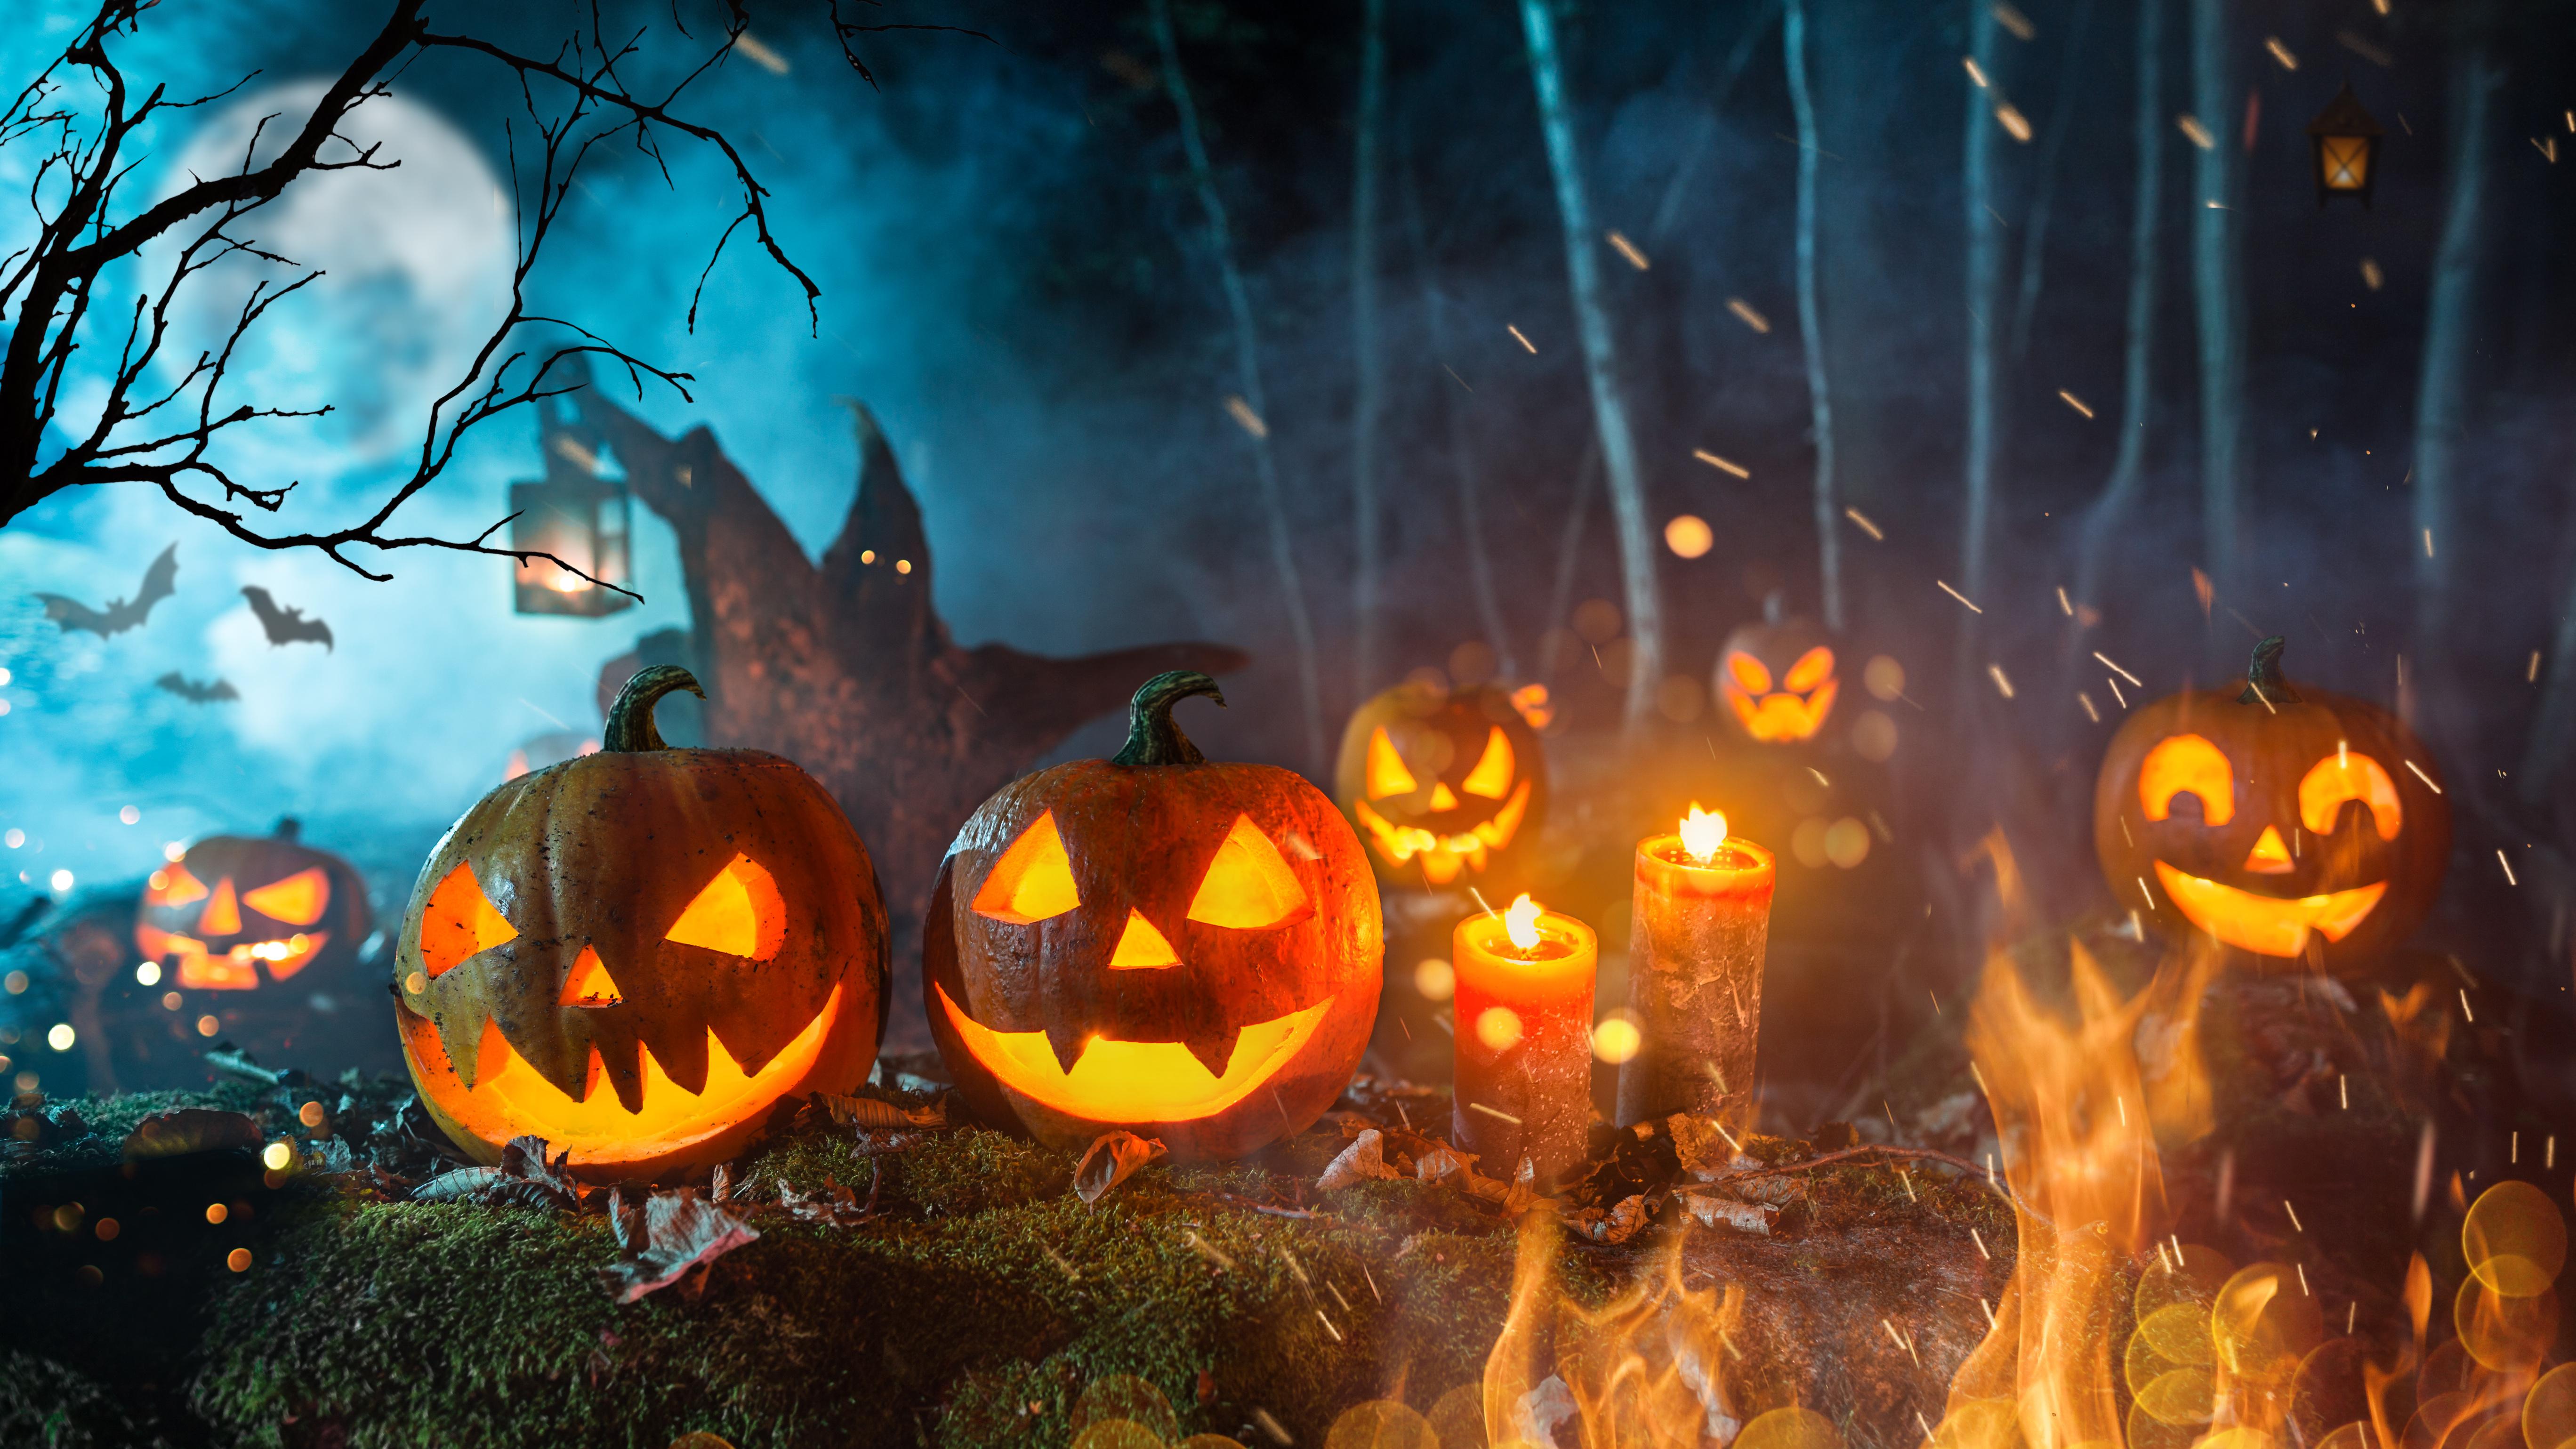 halloween_pumpkins_jack-o-lantern_deep_f